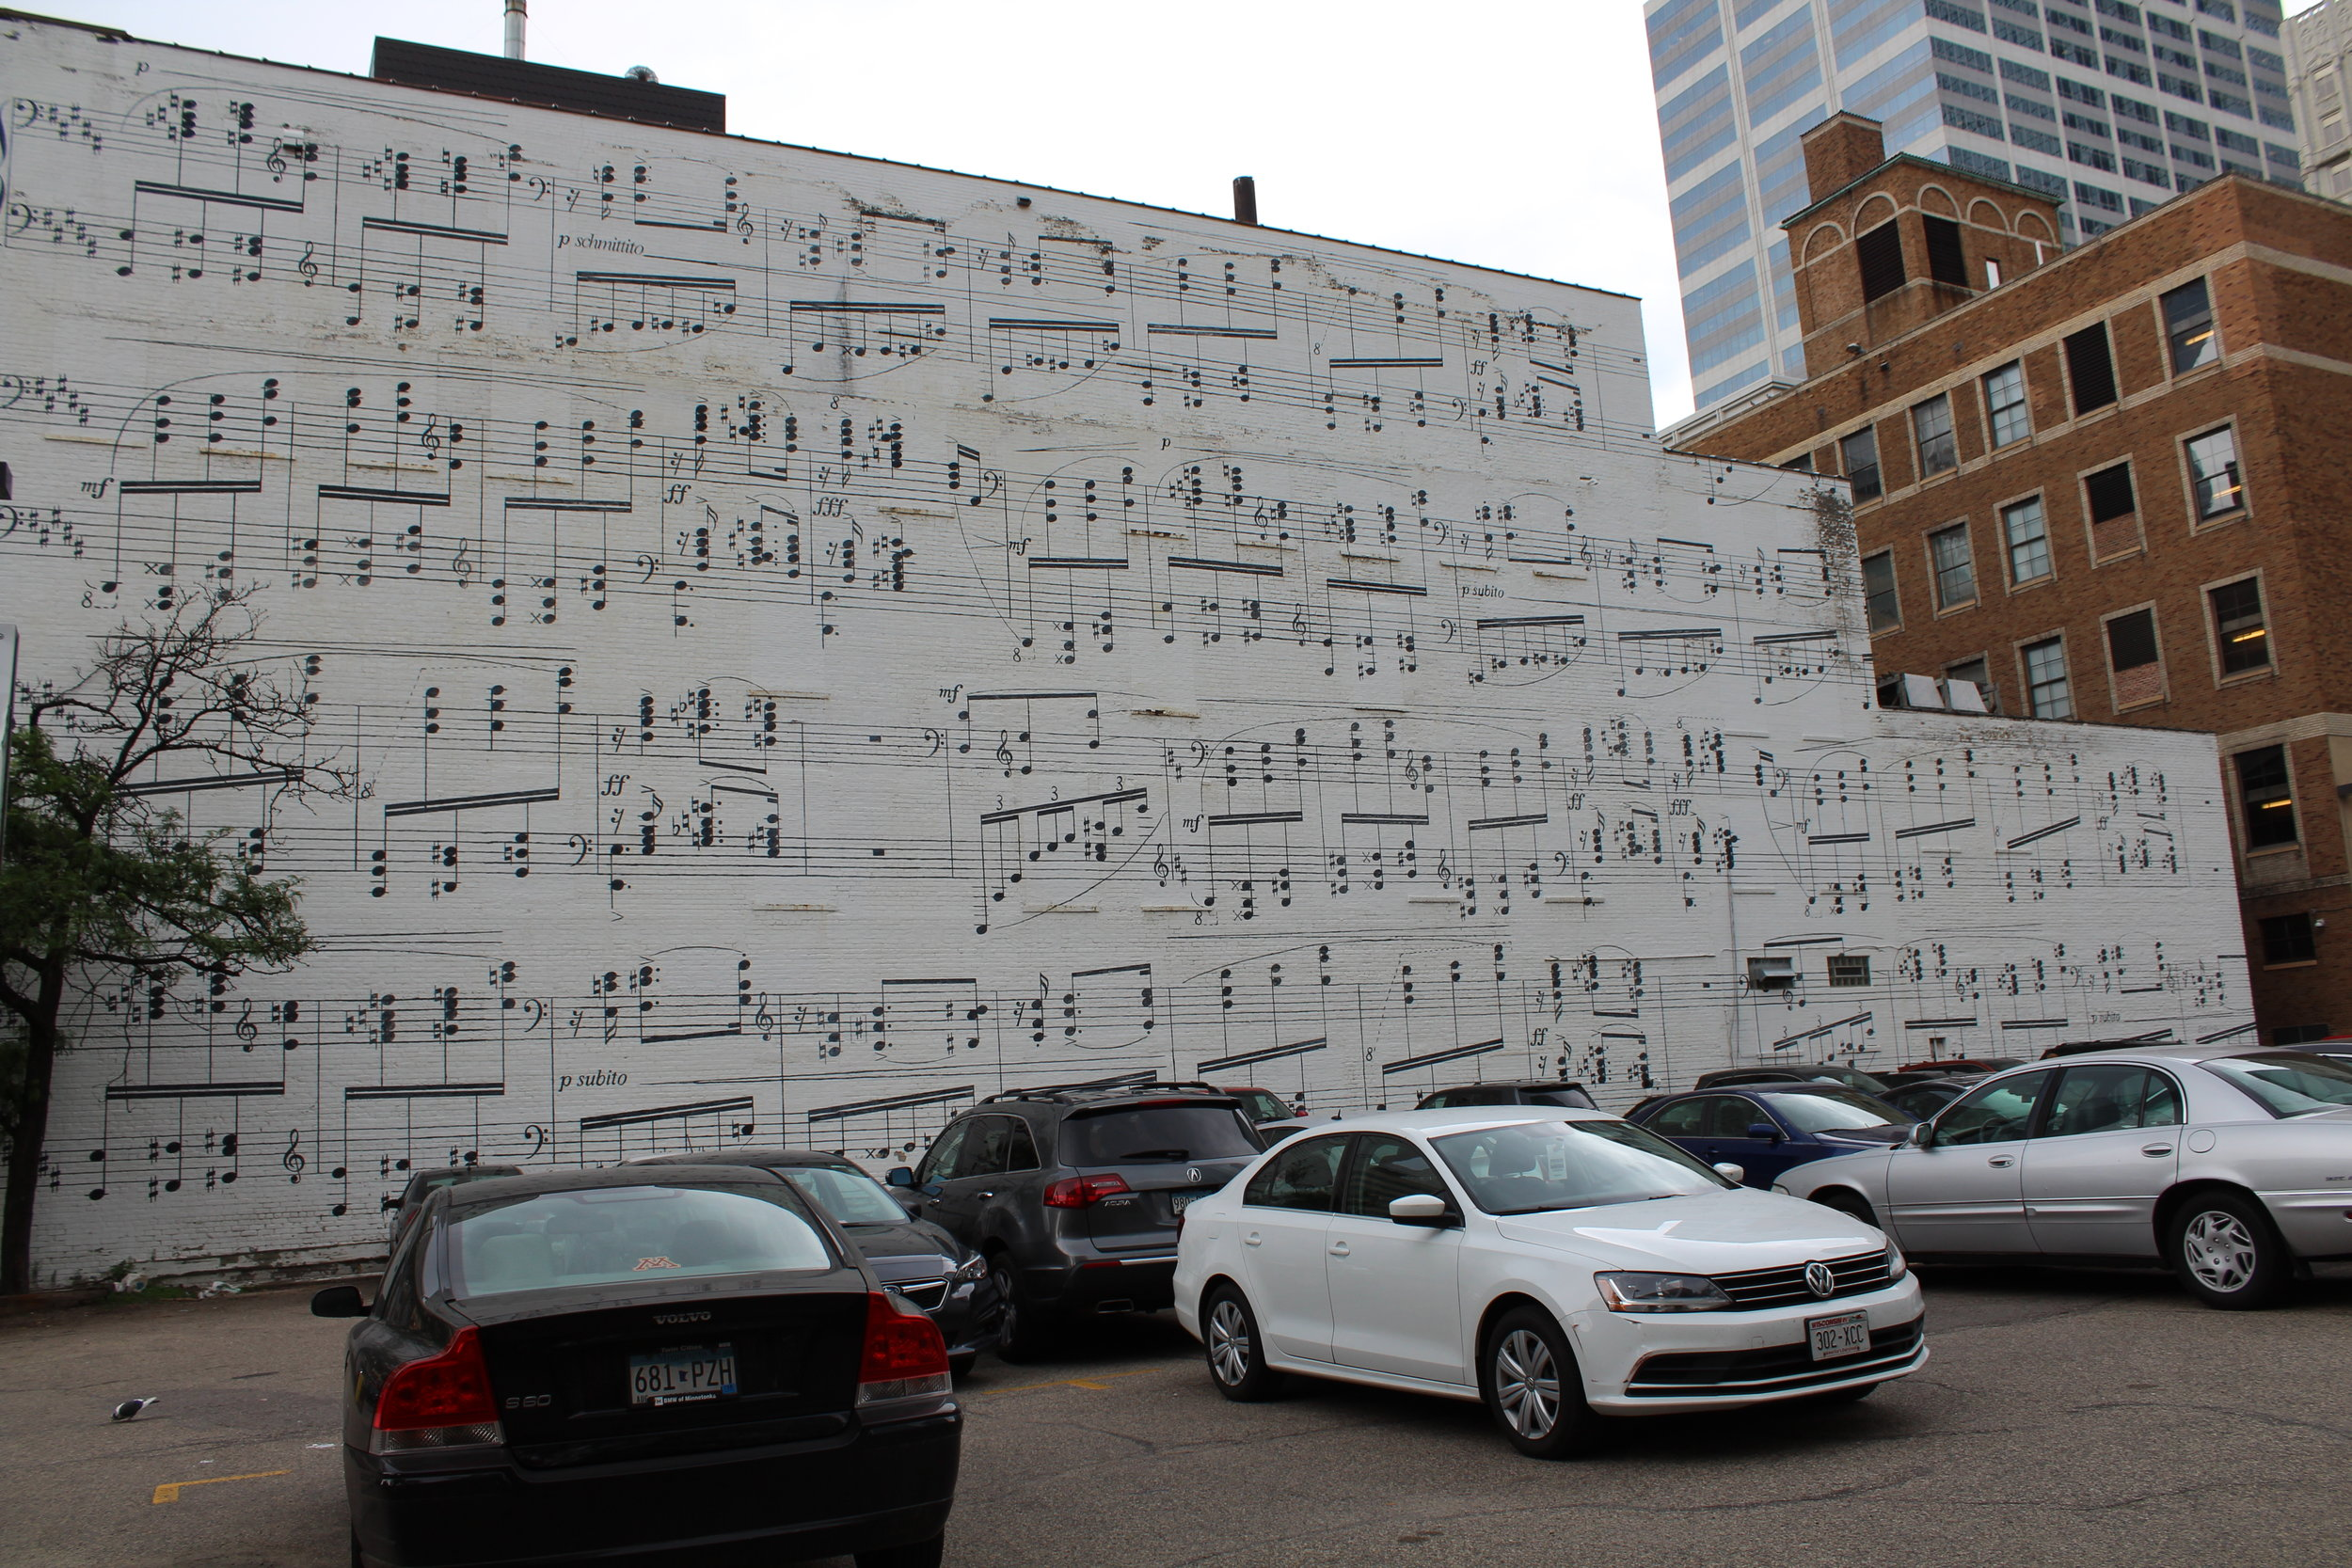 musicwall2.JPG